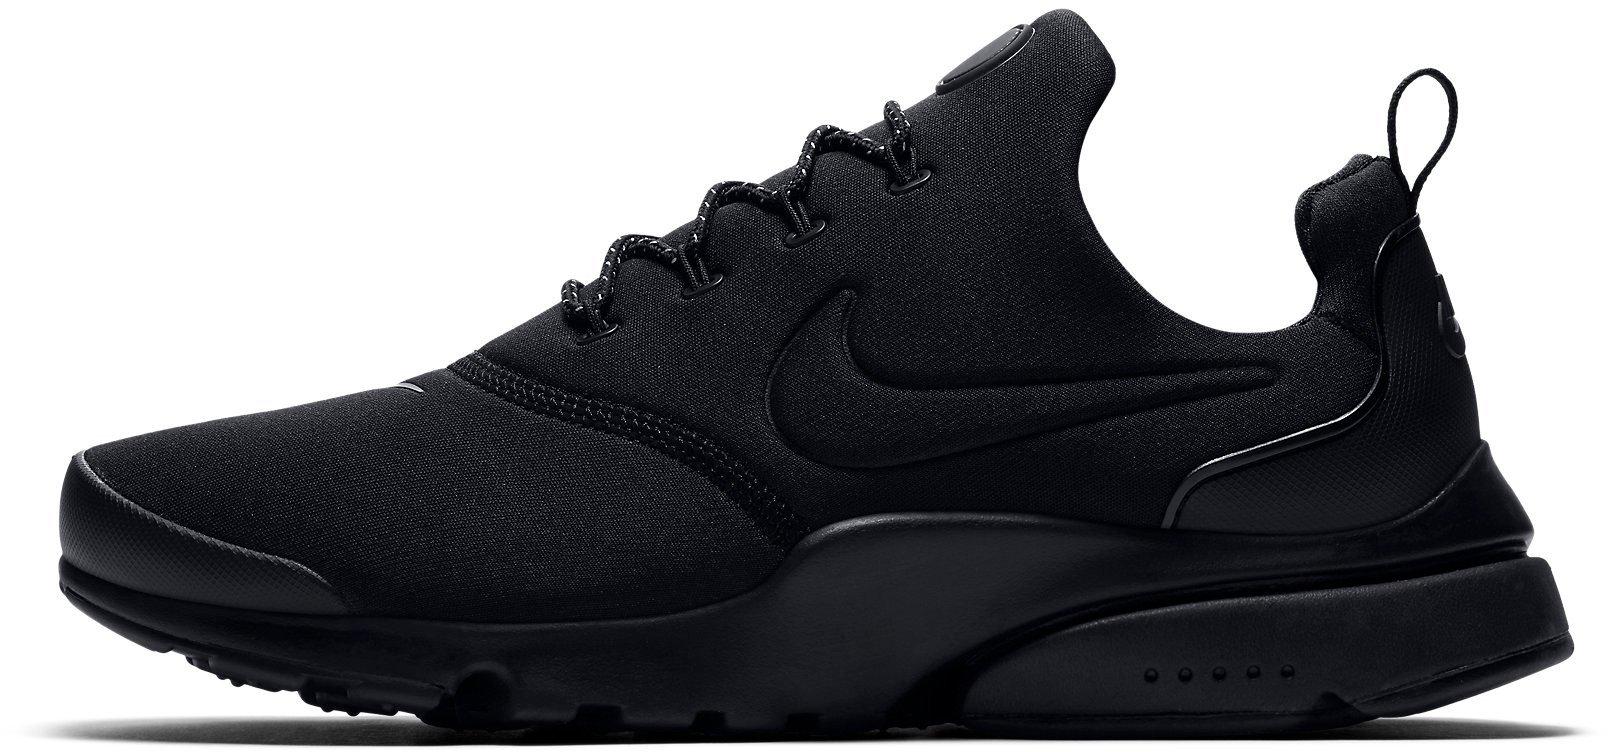 Shoes Nike PRESTO FLY SE - Top4Football.com